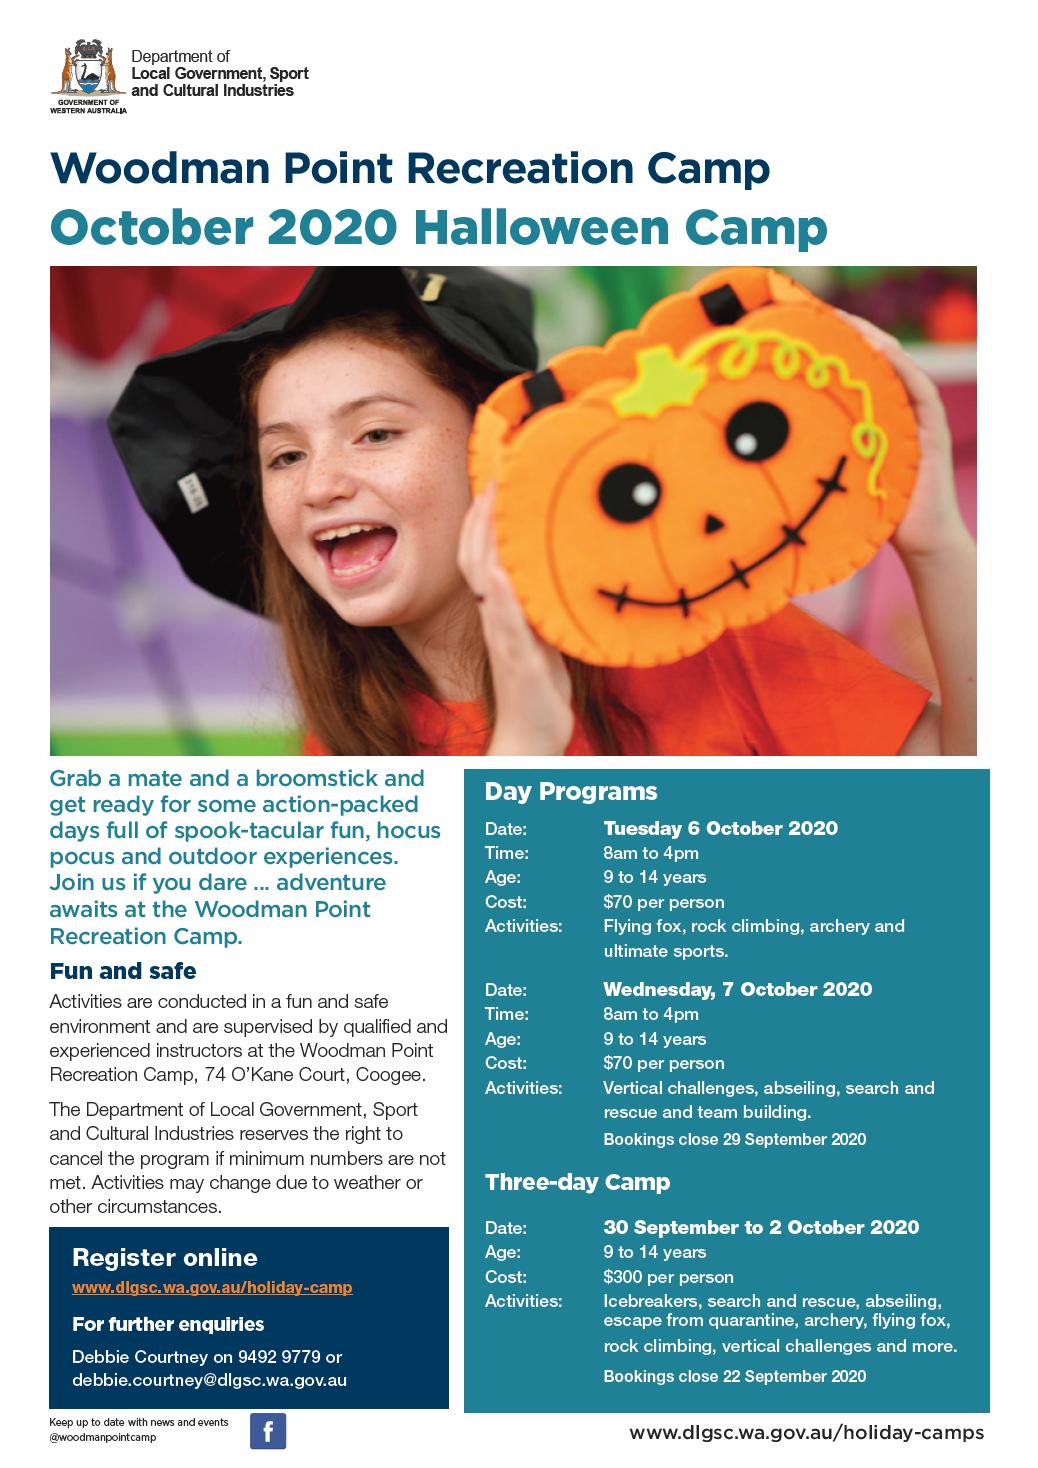 Woodman Point Halloween Programs October 2020 flyer